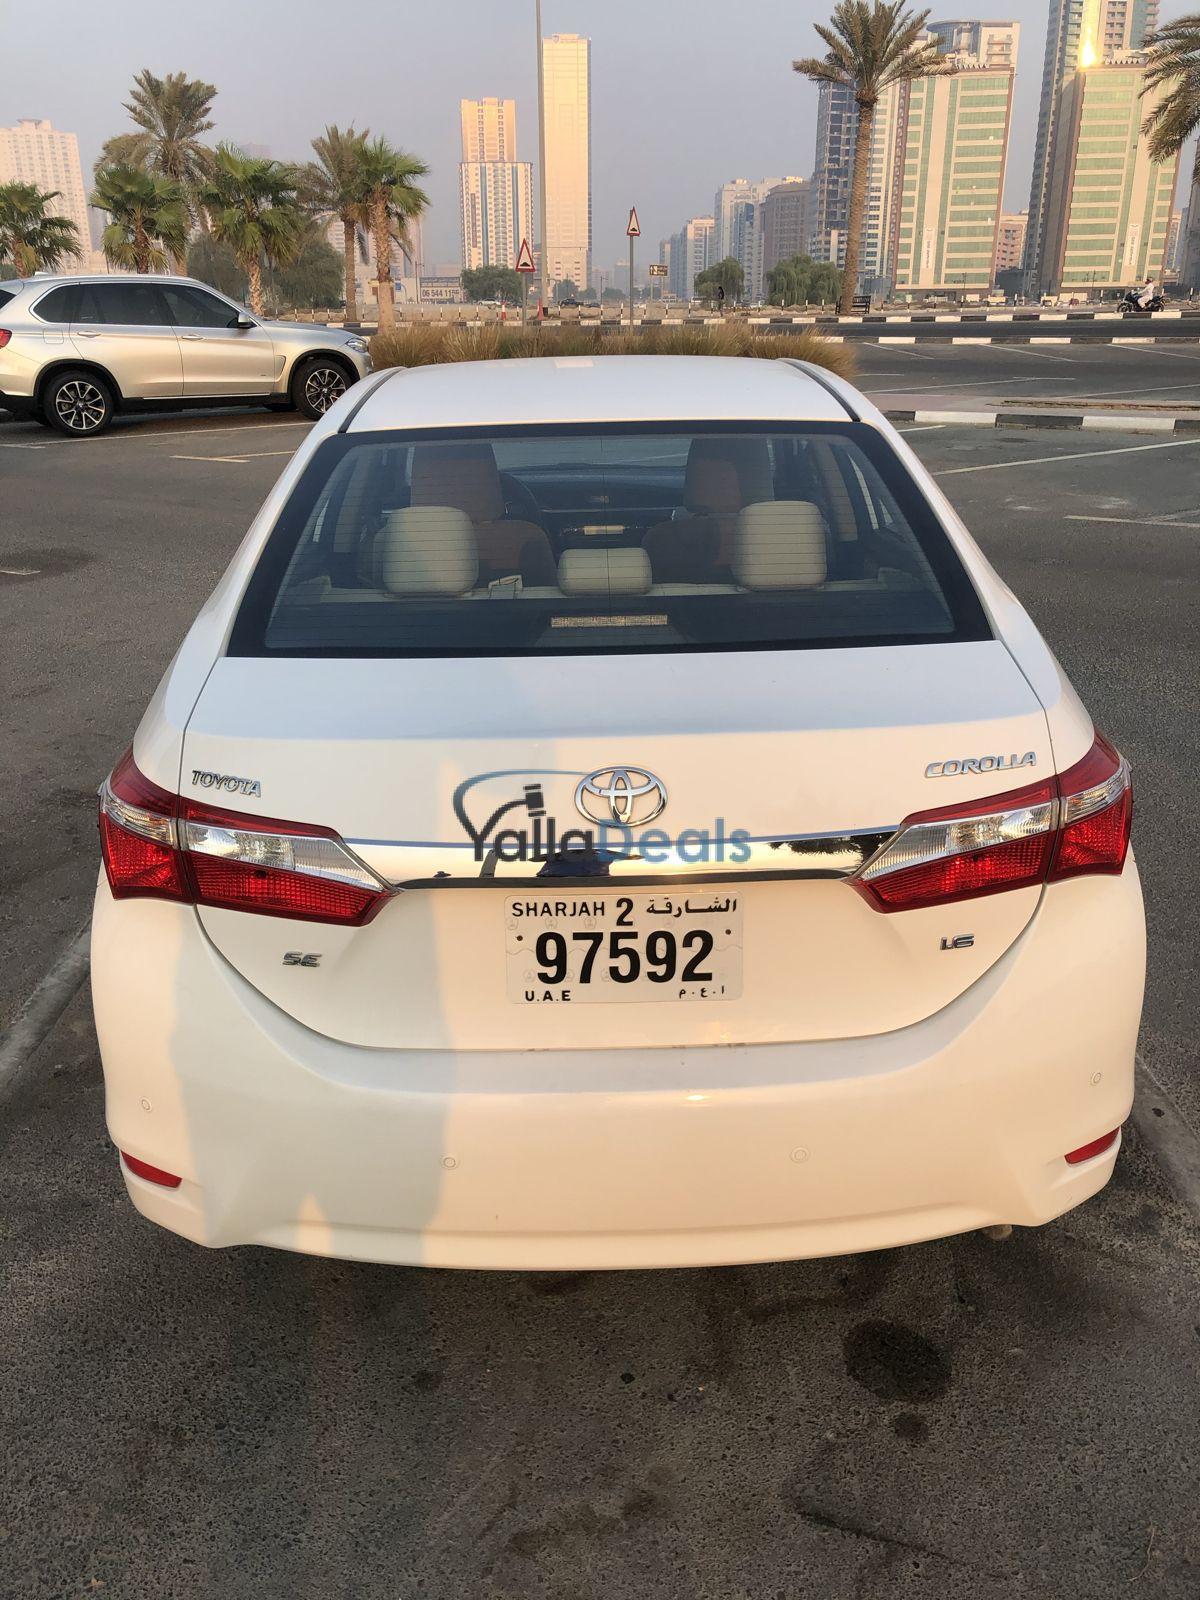 Cars for Sale_Toyota_Acacia Avenues